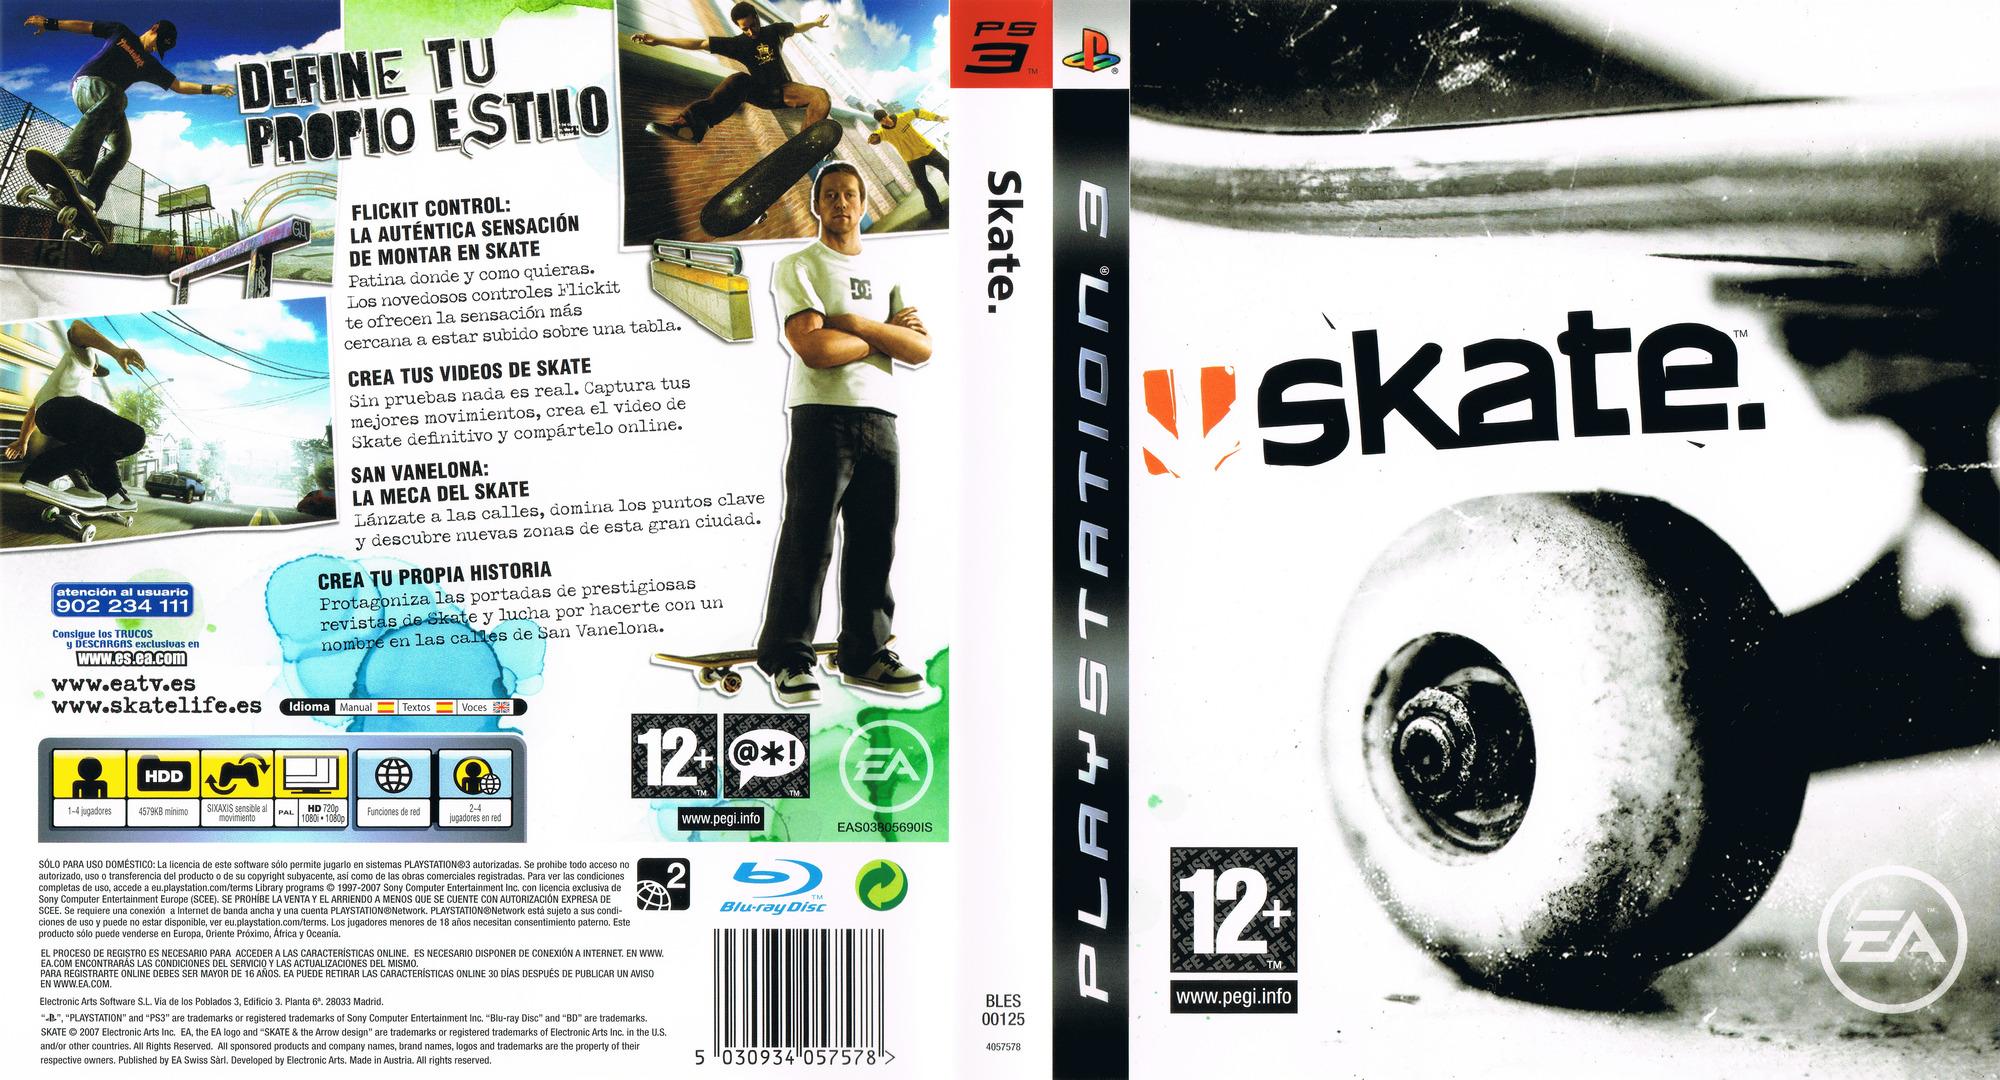 PS3 coverfullHQ (BLES00125)